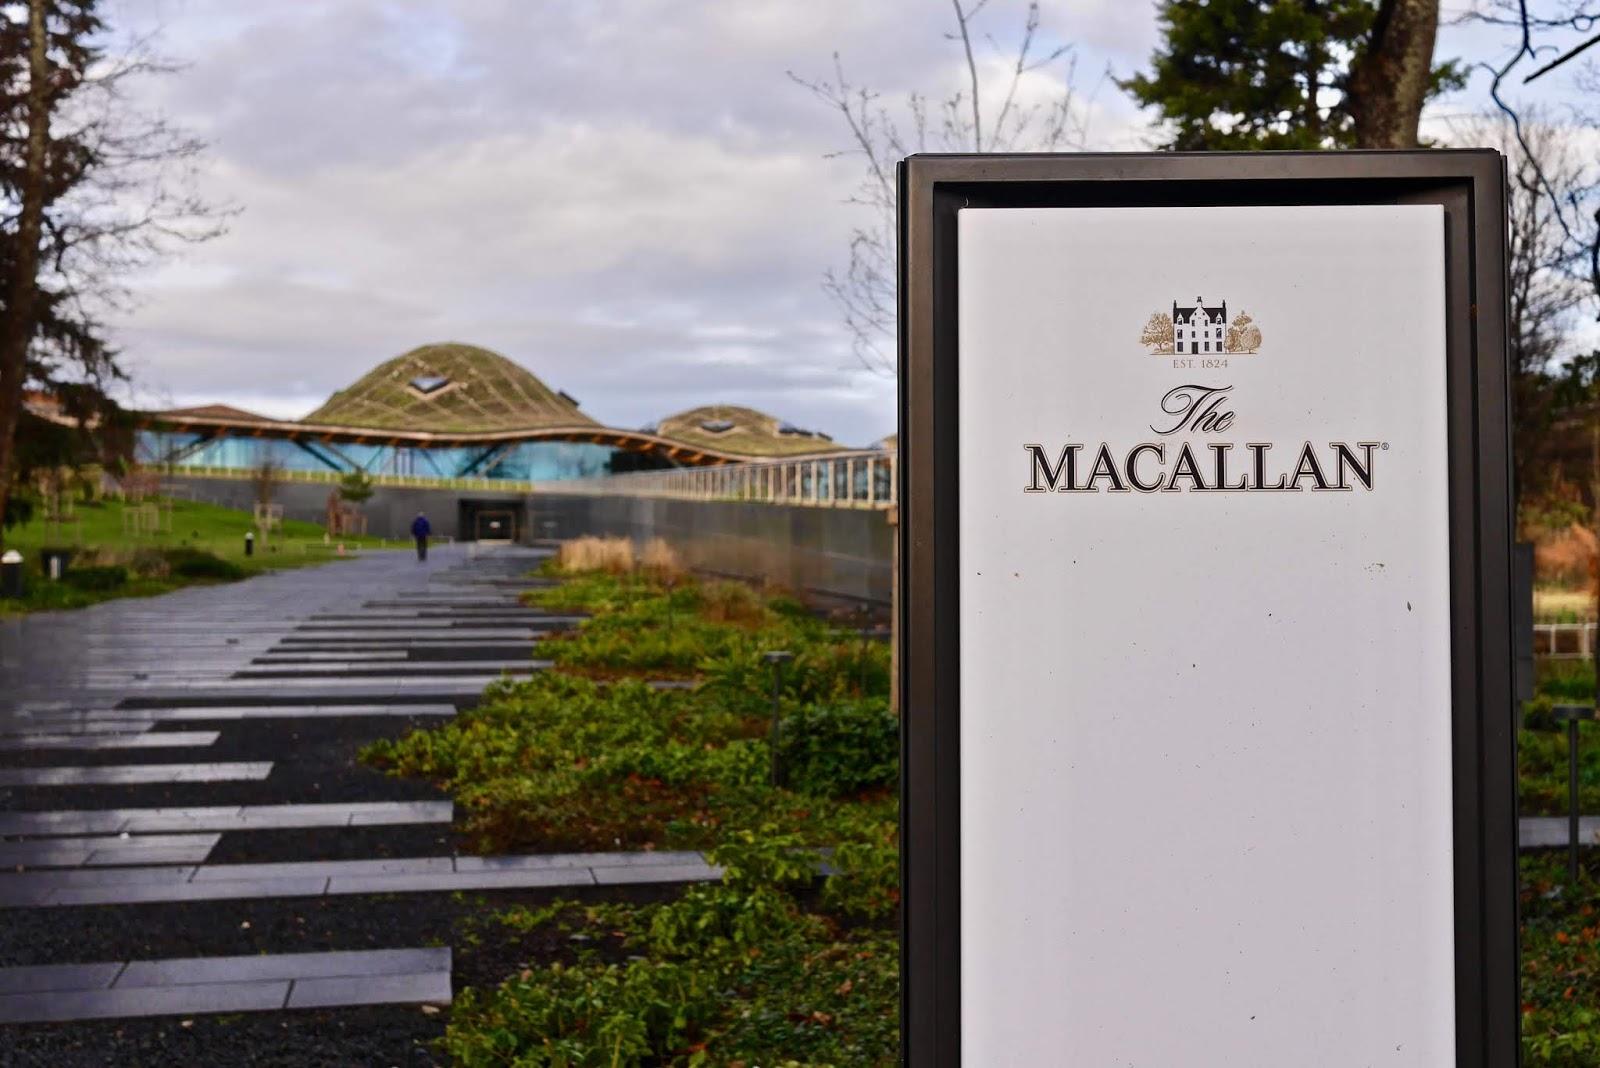 Macallan Distillery by www.CalMcTrasvels.com